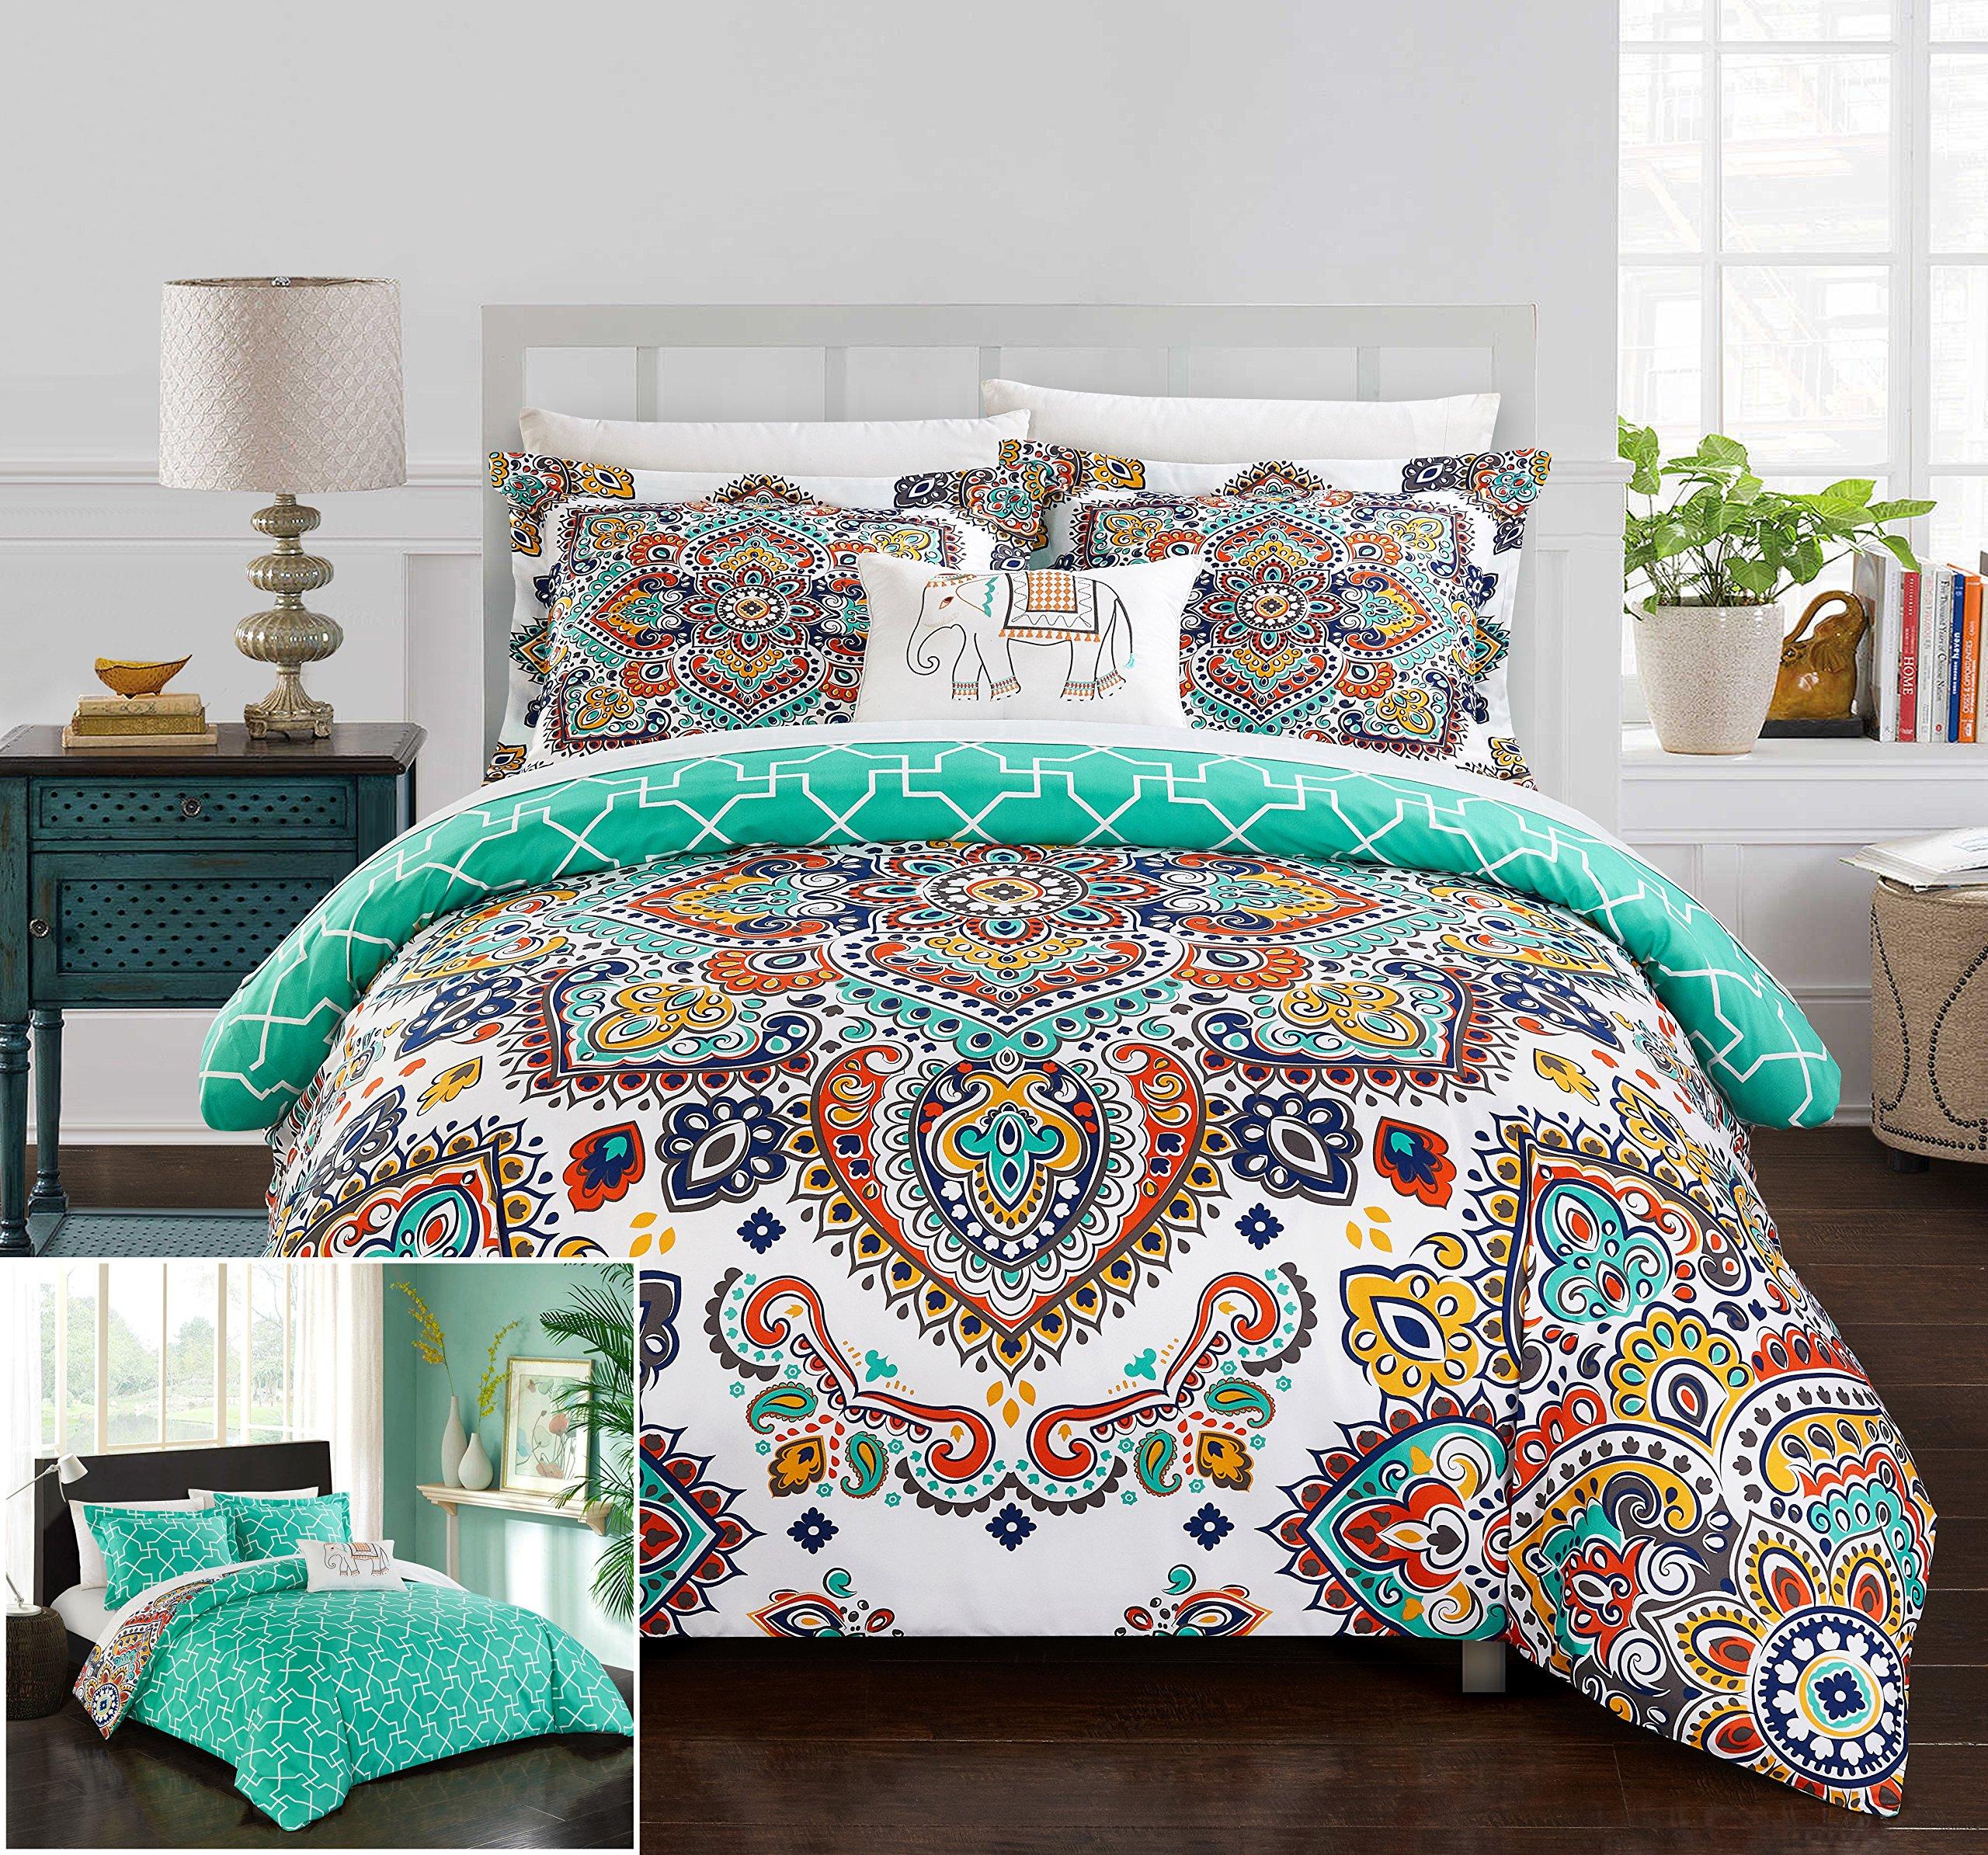 Chic Home 4 Piece Karen Reversible Boho-inspired print and contemporary geometric patterned technique King Duvet Cover Set Aqua